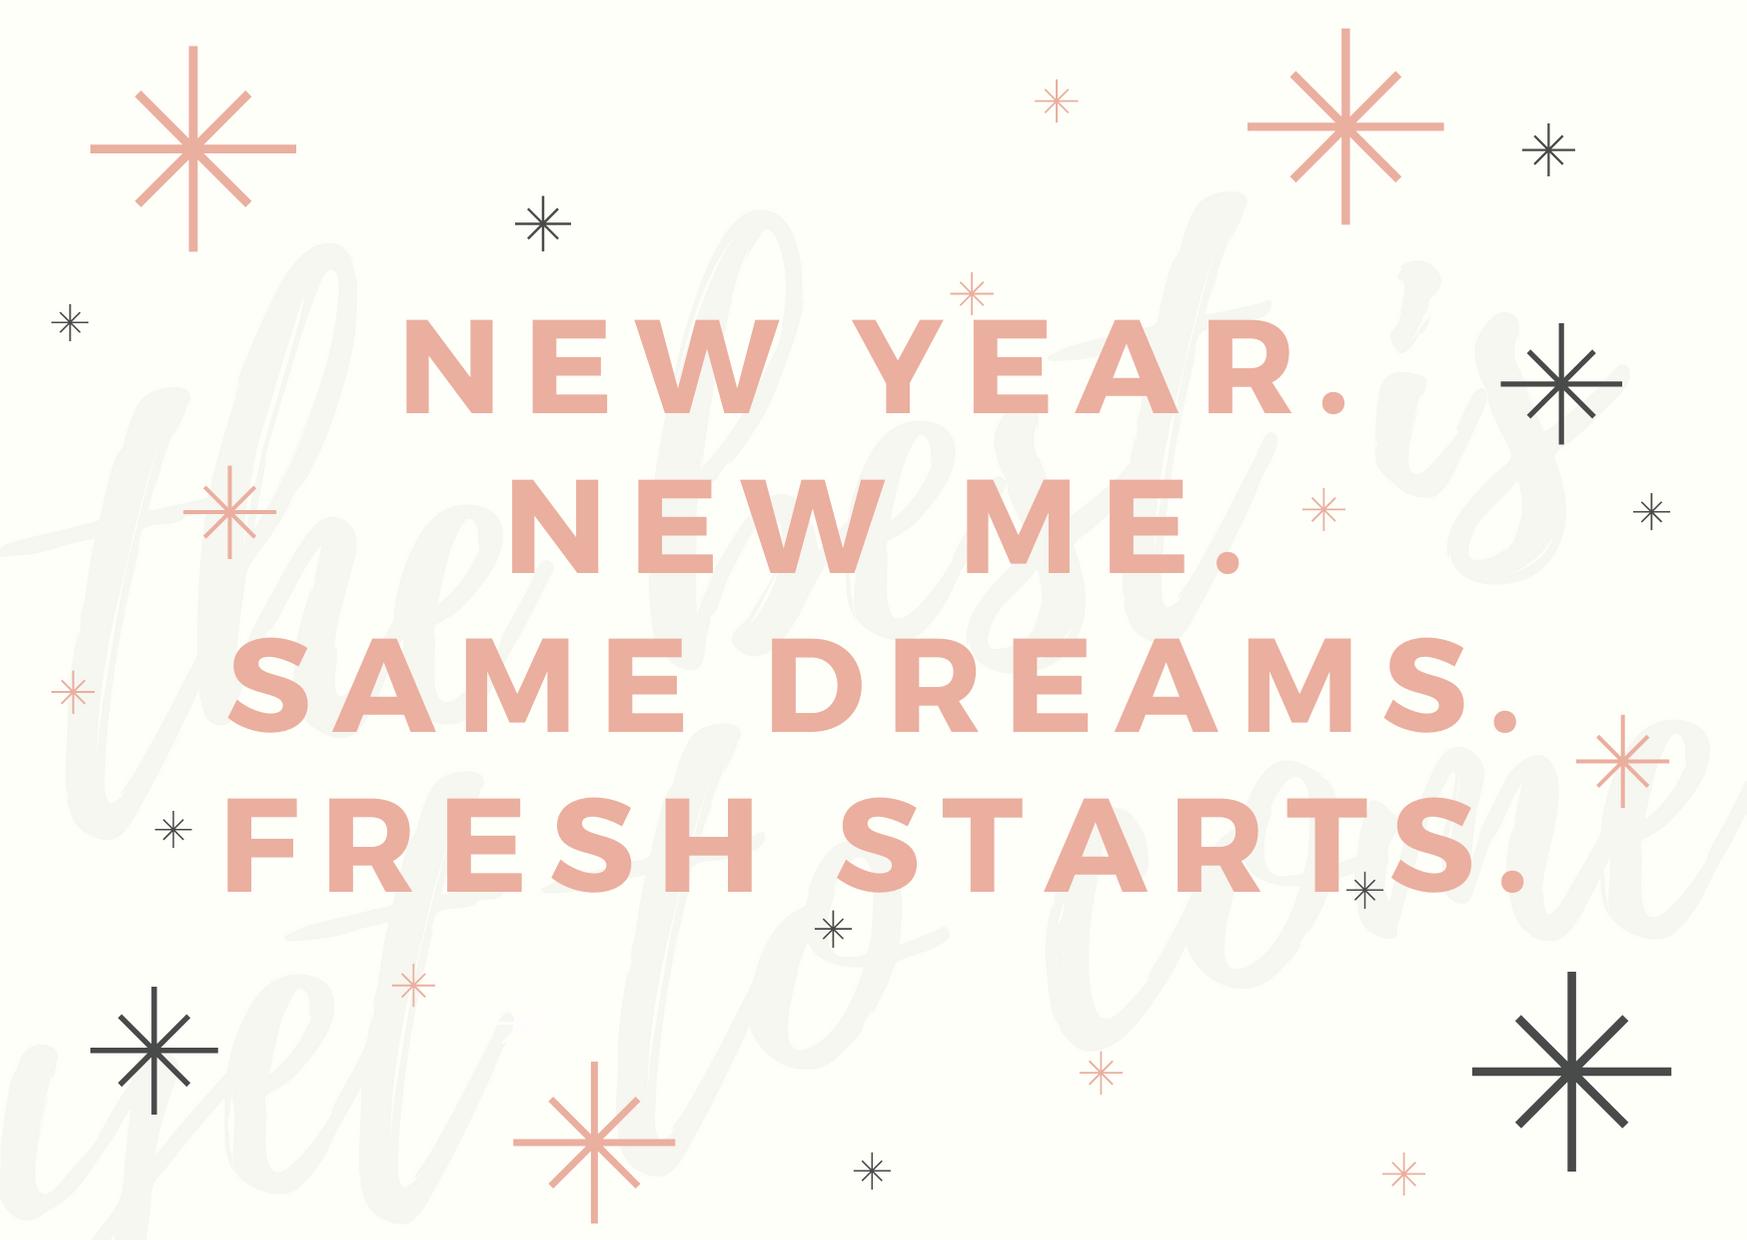 New year. New me. Same dreams. Fresh starts.